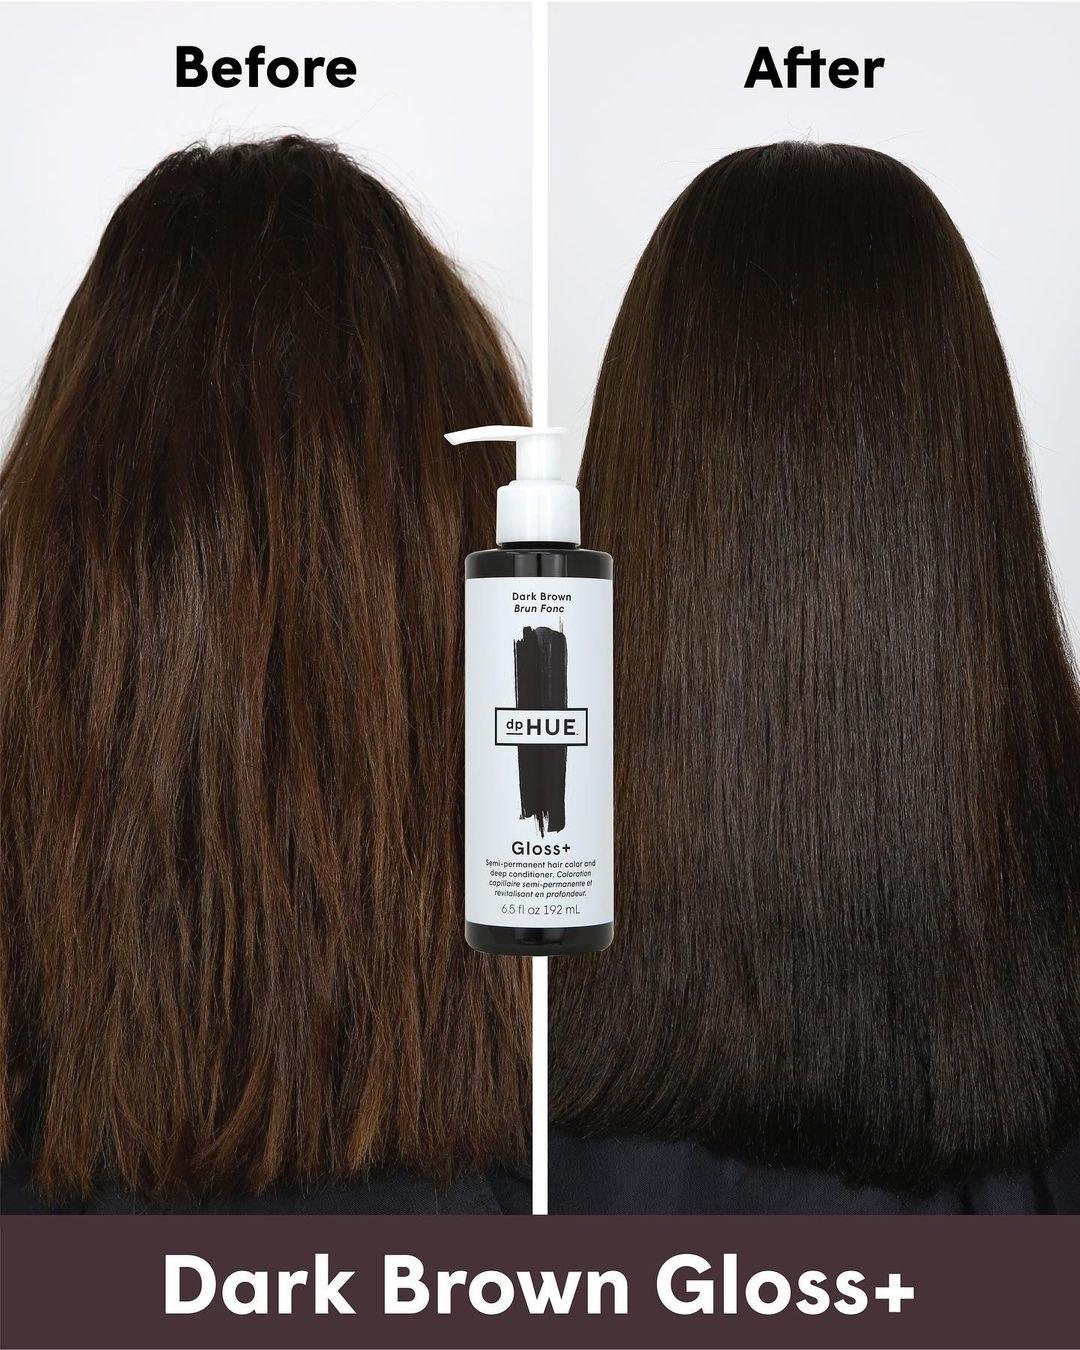 A model's medium brown hair before using dark brown gloss+ and the same model's dark brown hair after use